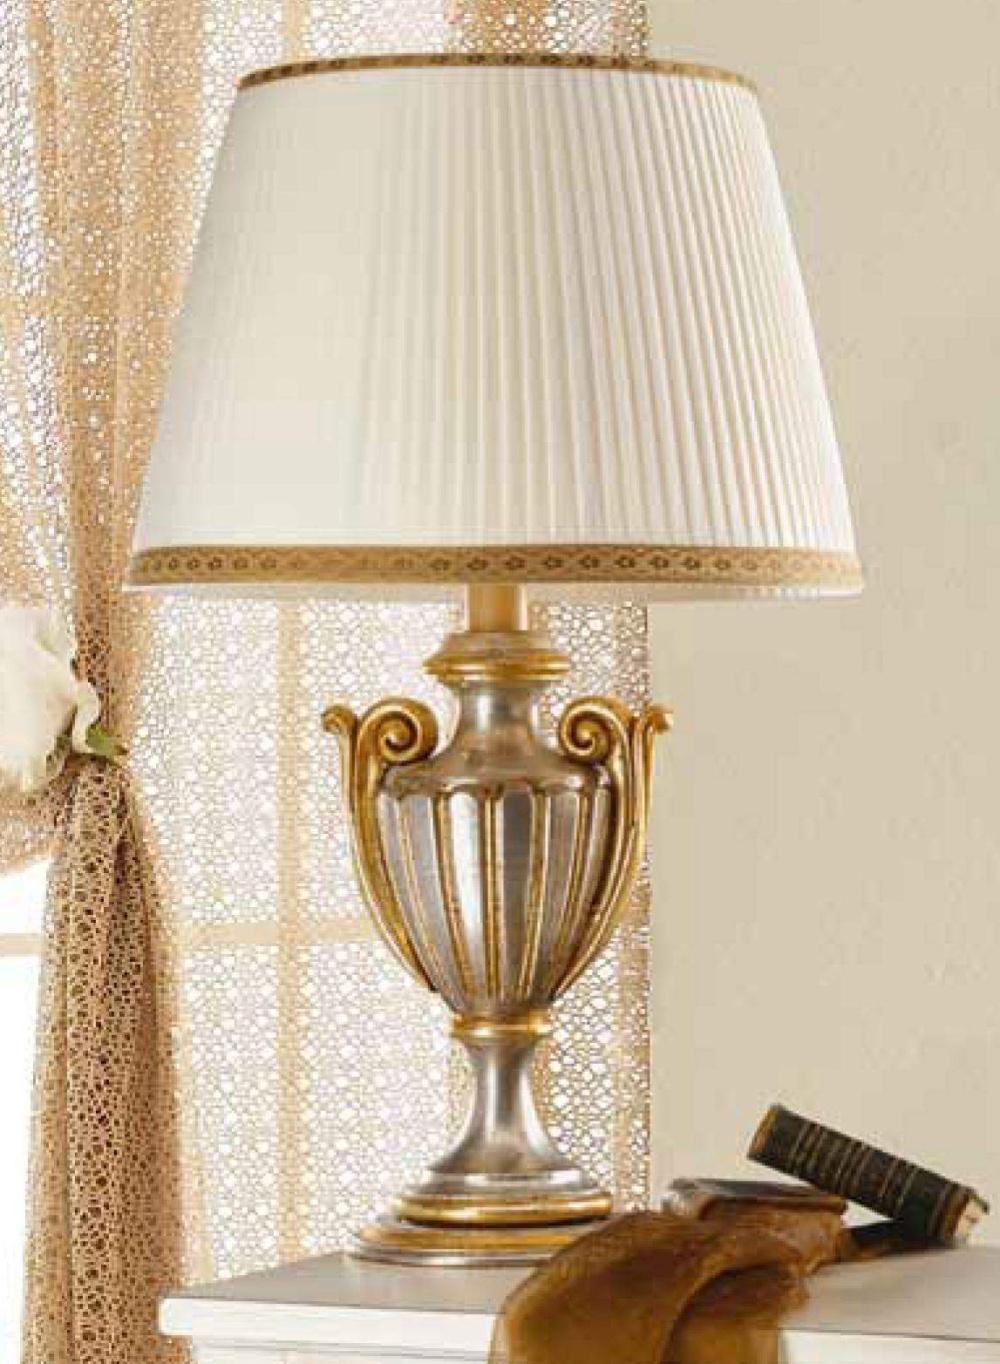 Настольная лампа Andrea Fanfani - 922